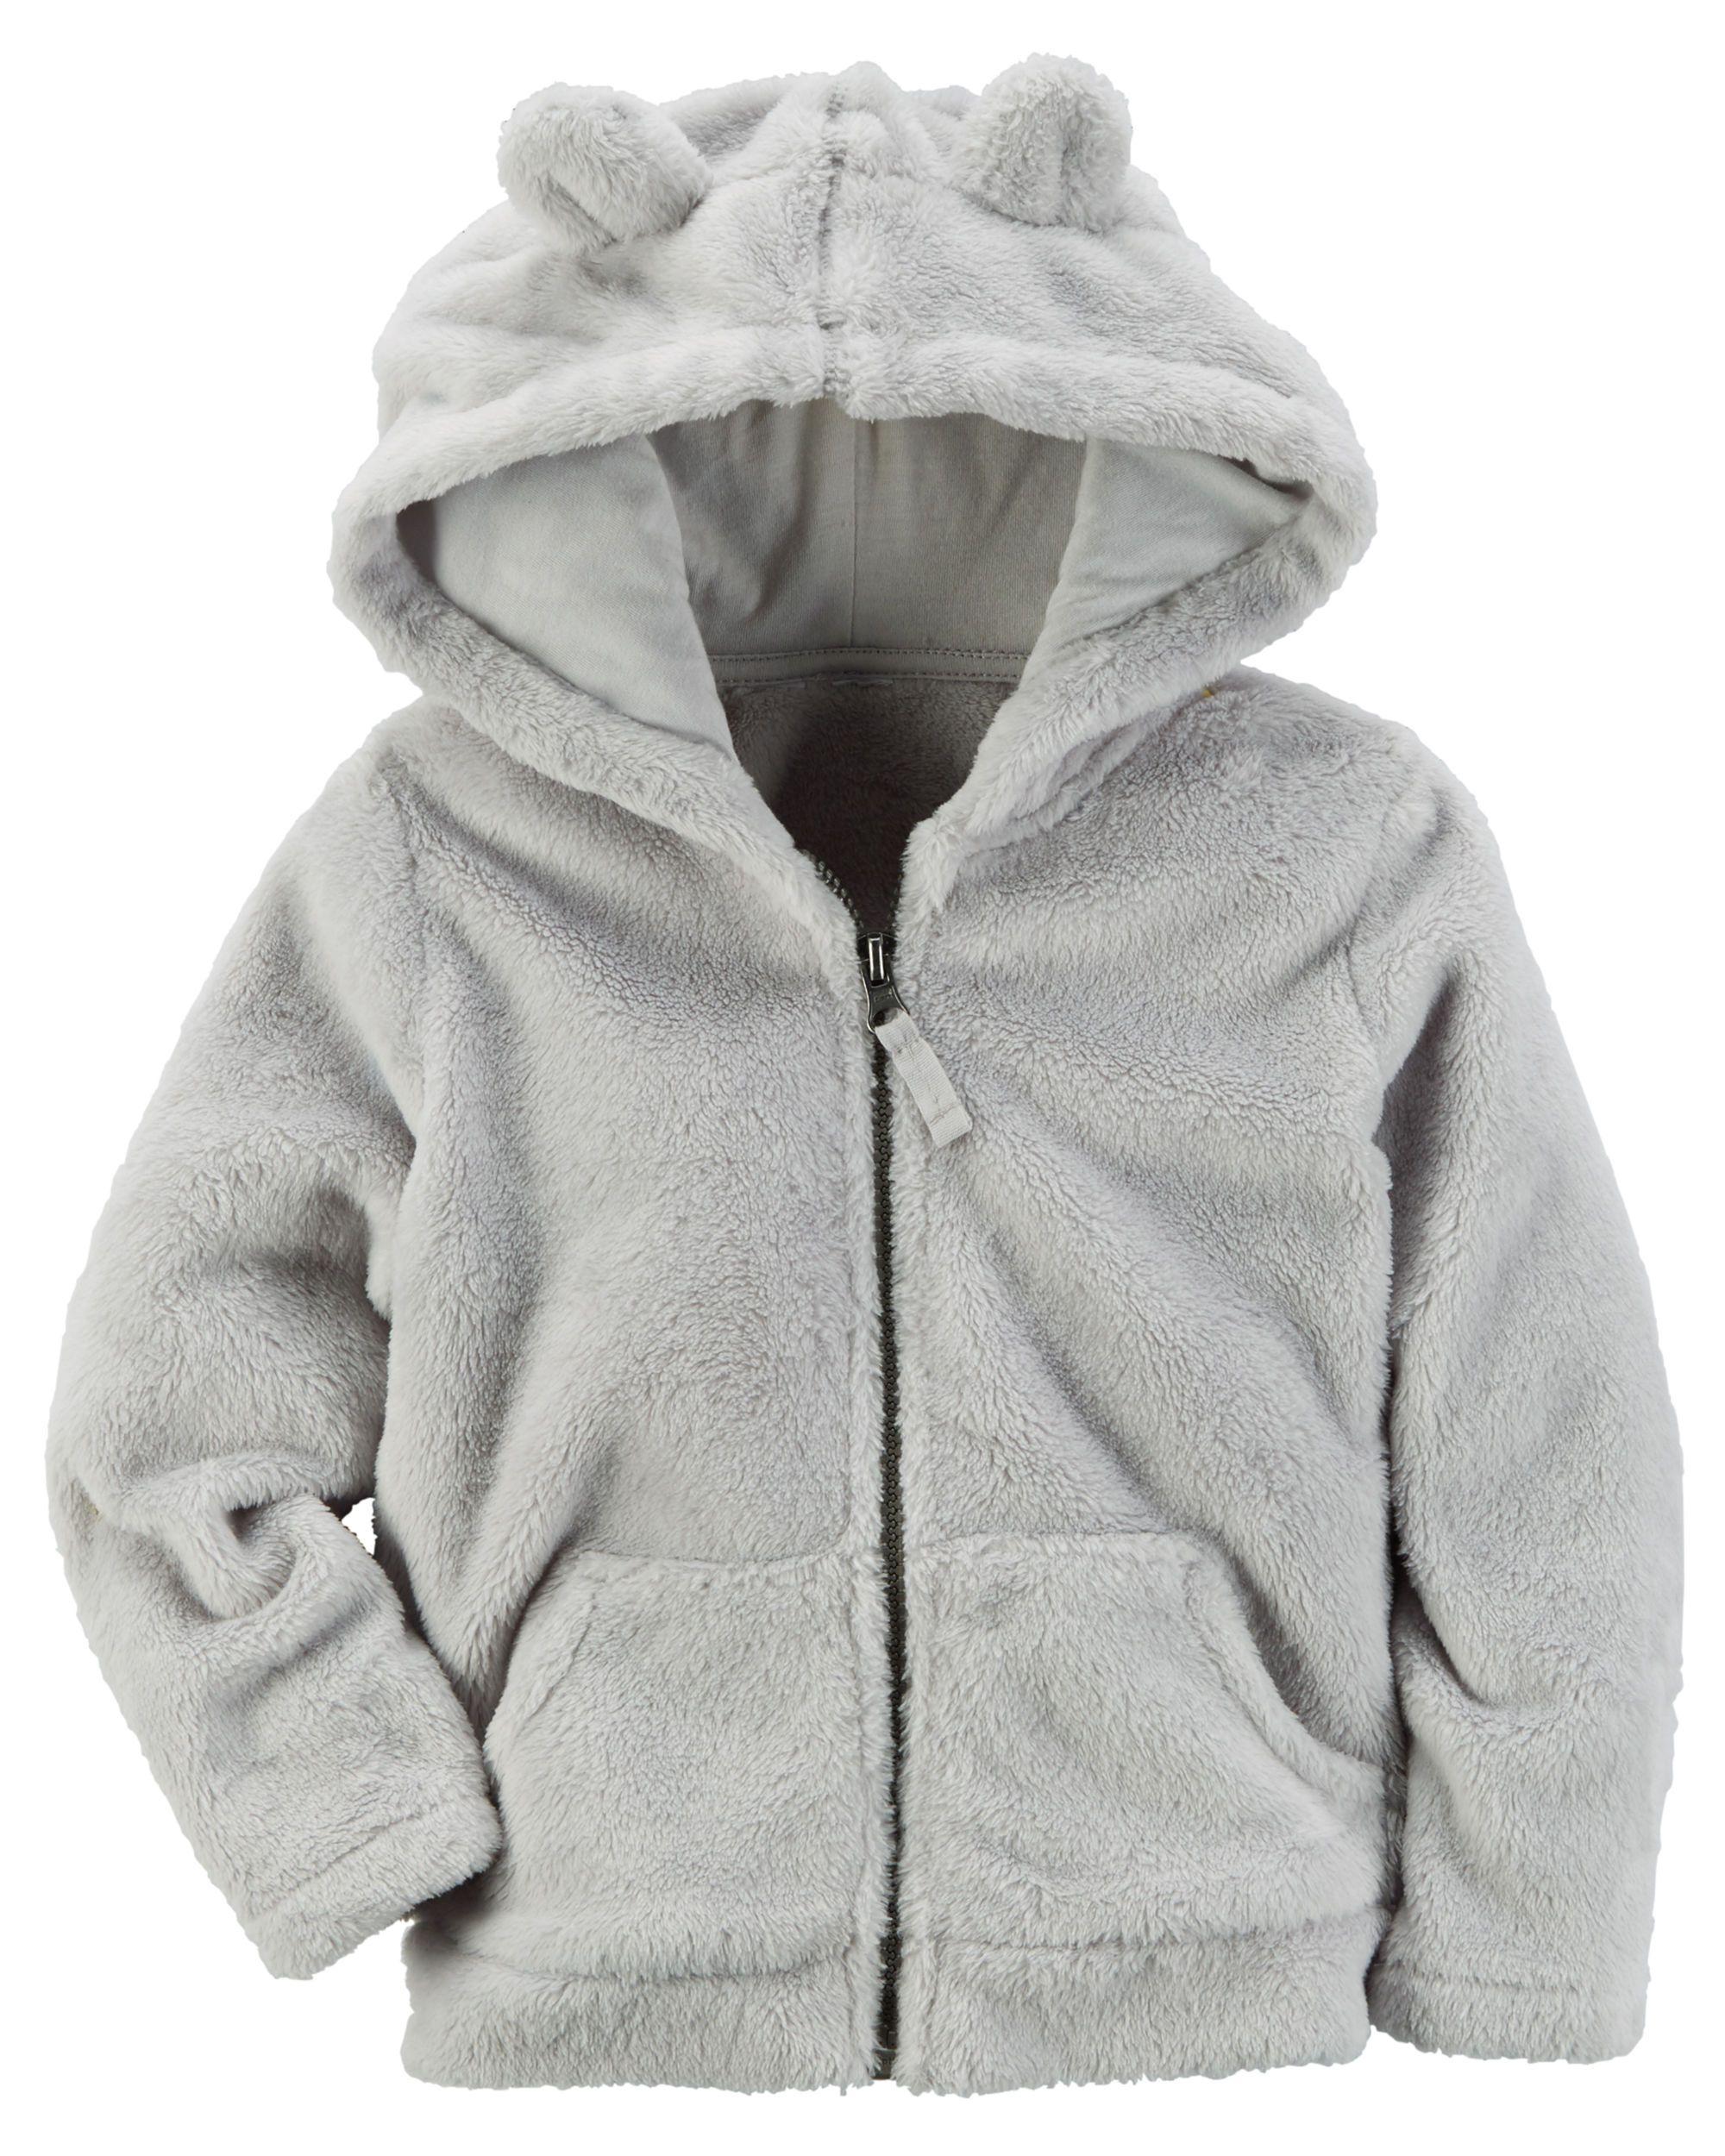 Snow Fleece Hoodie | Sherpa hoodie, Babies clothes and Kids girls